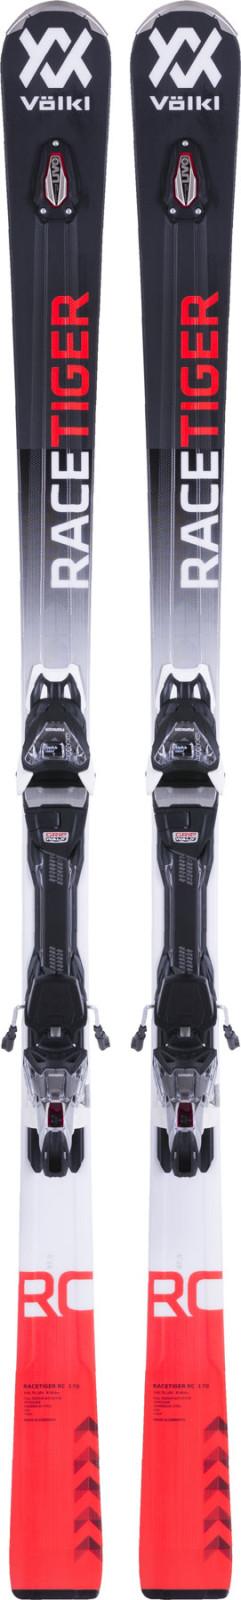 Völkl Racetiger RC Black + vMotion 11 GW